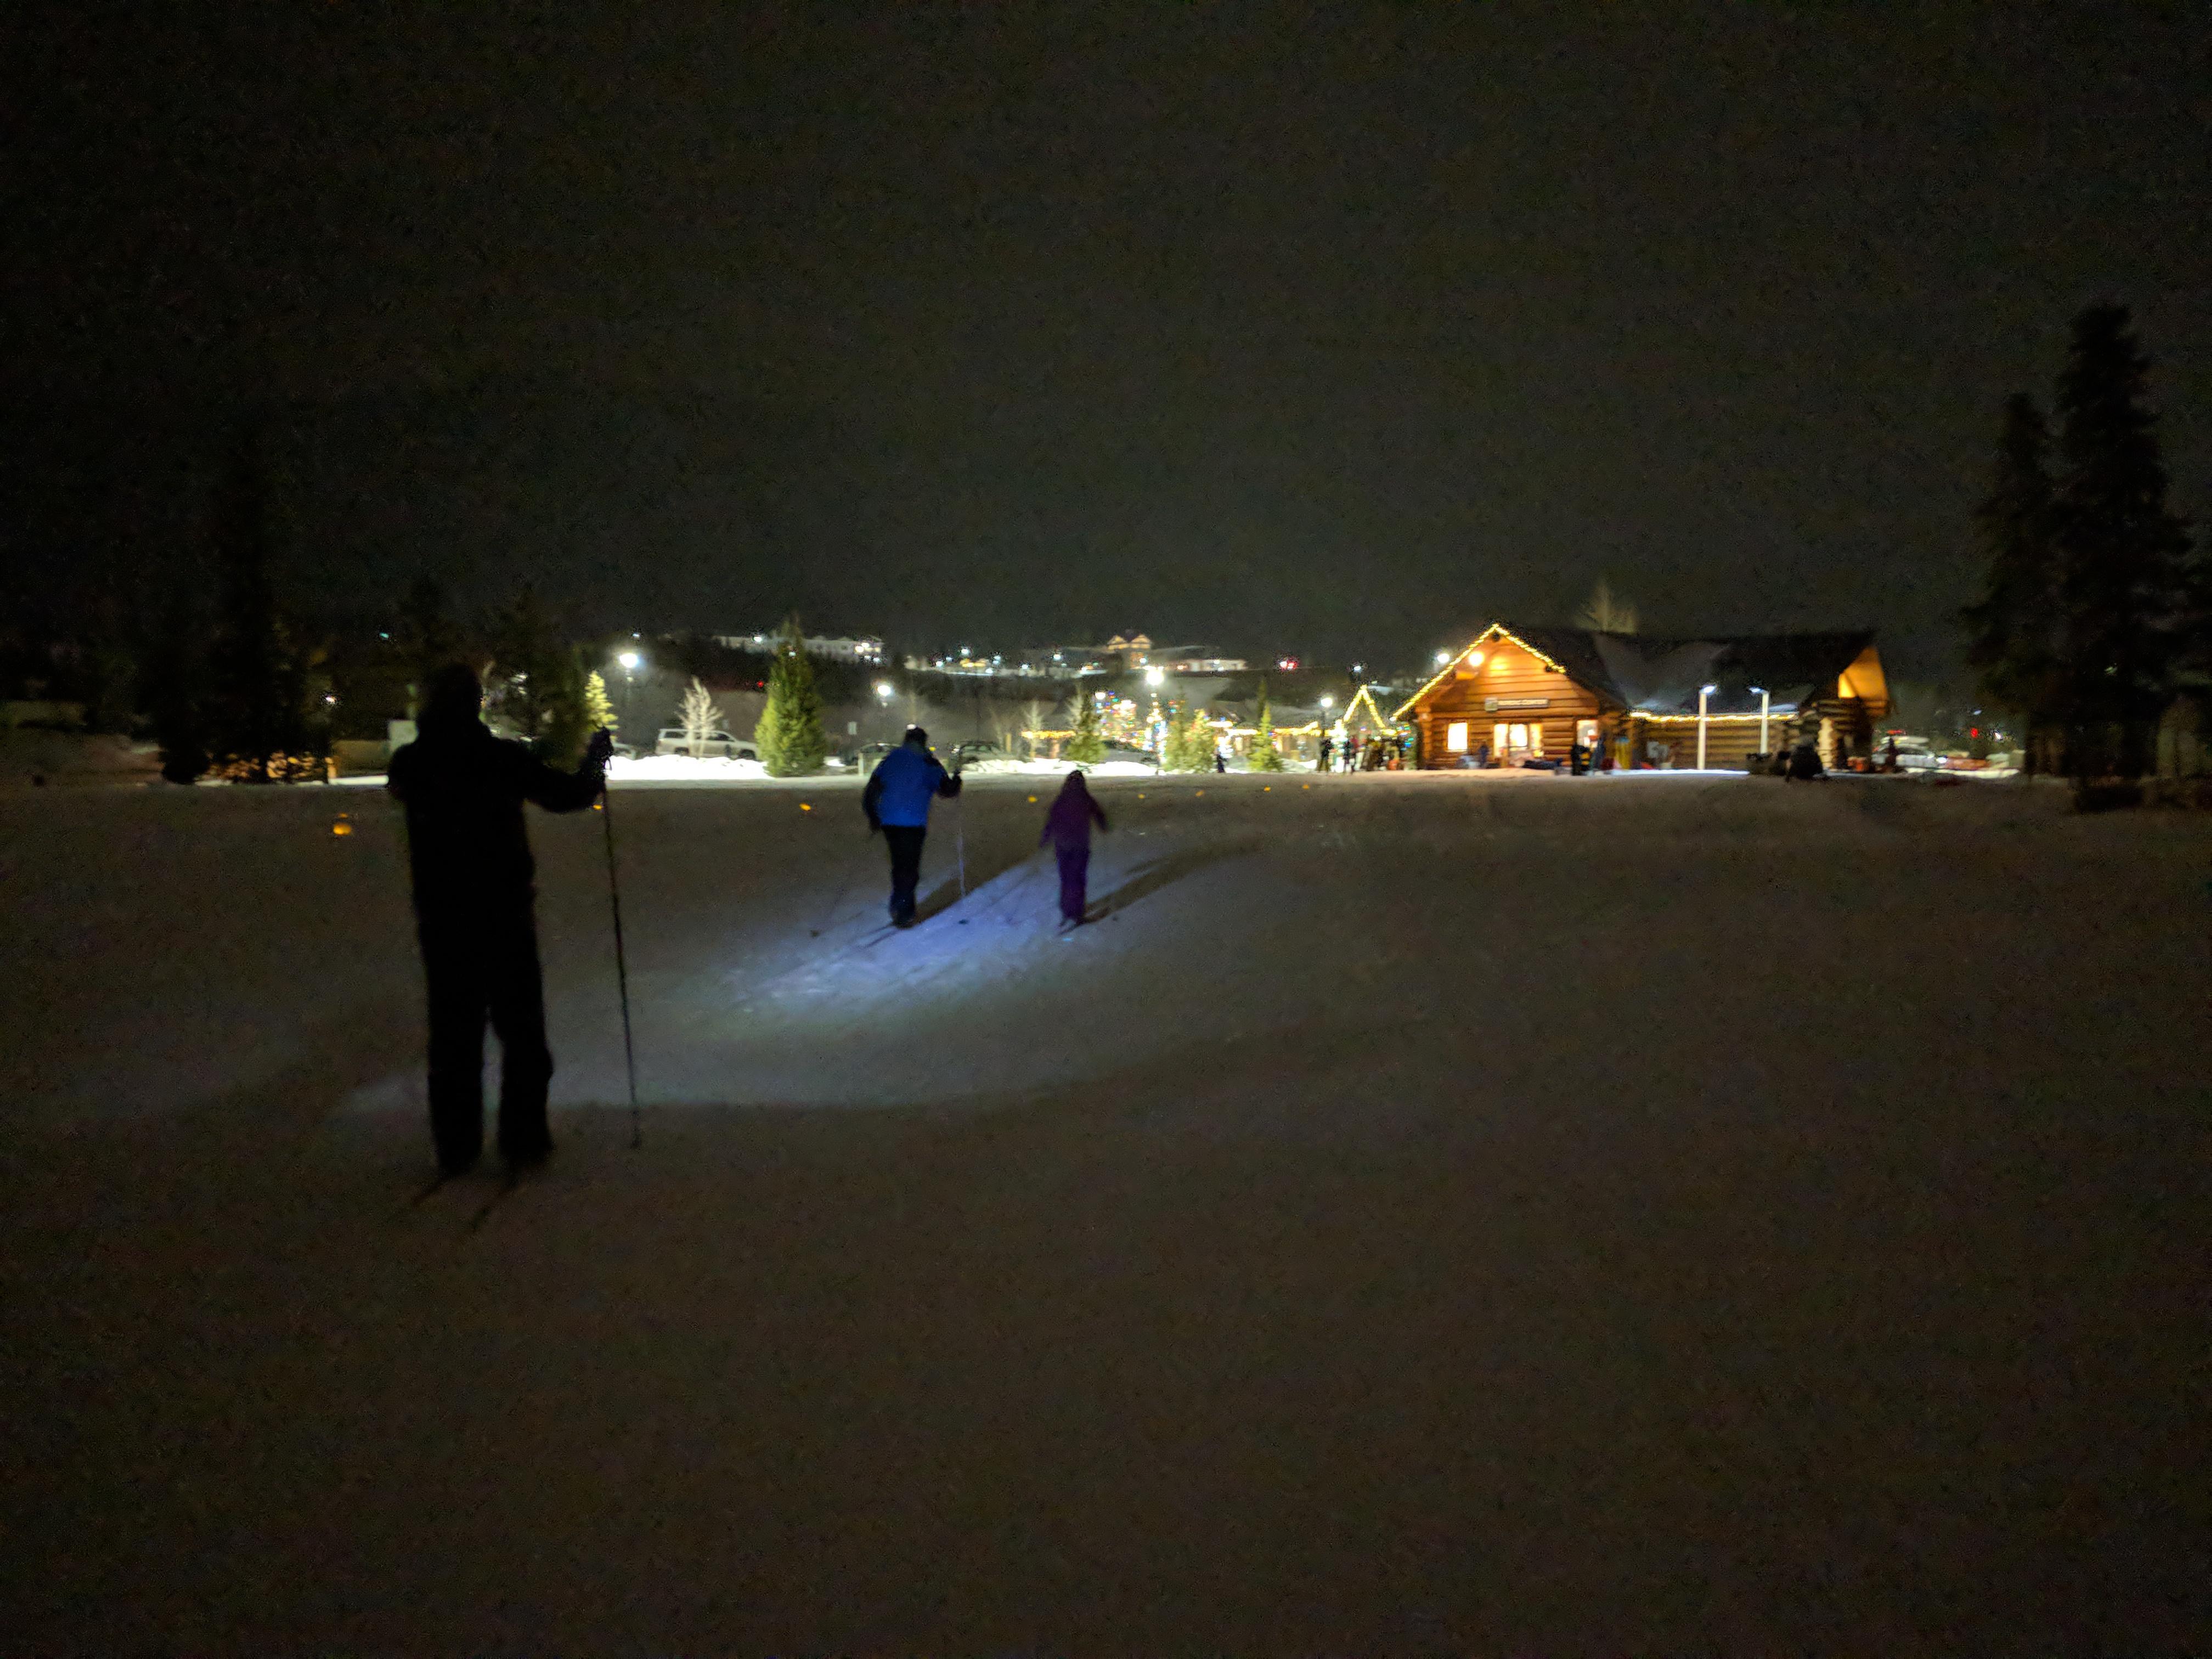 EAt Ski Be Merry